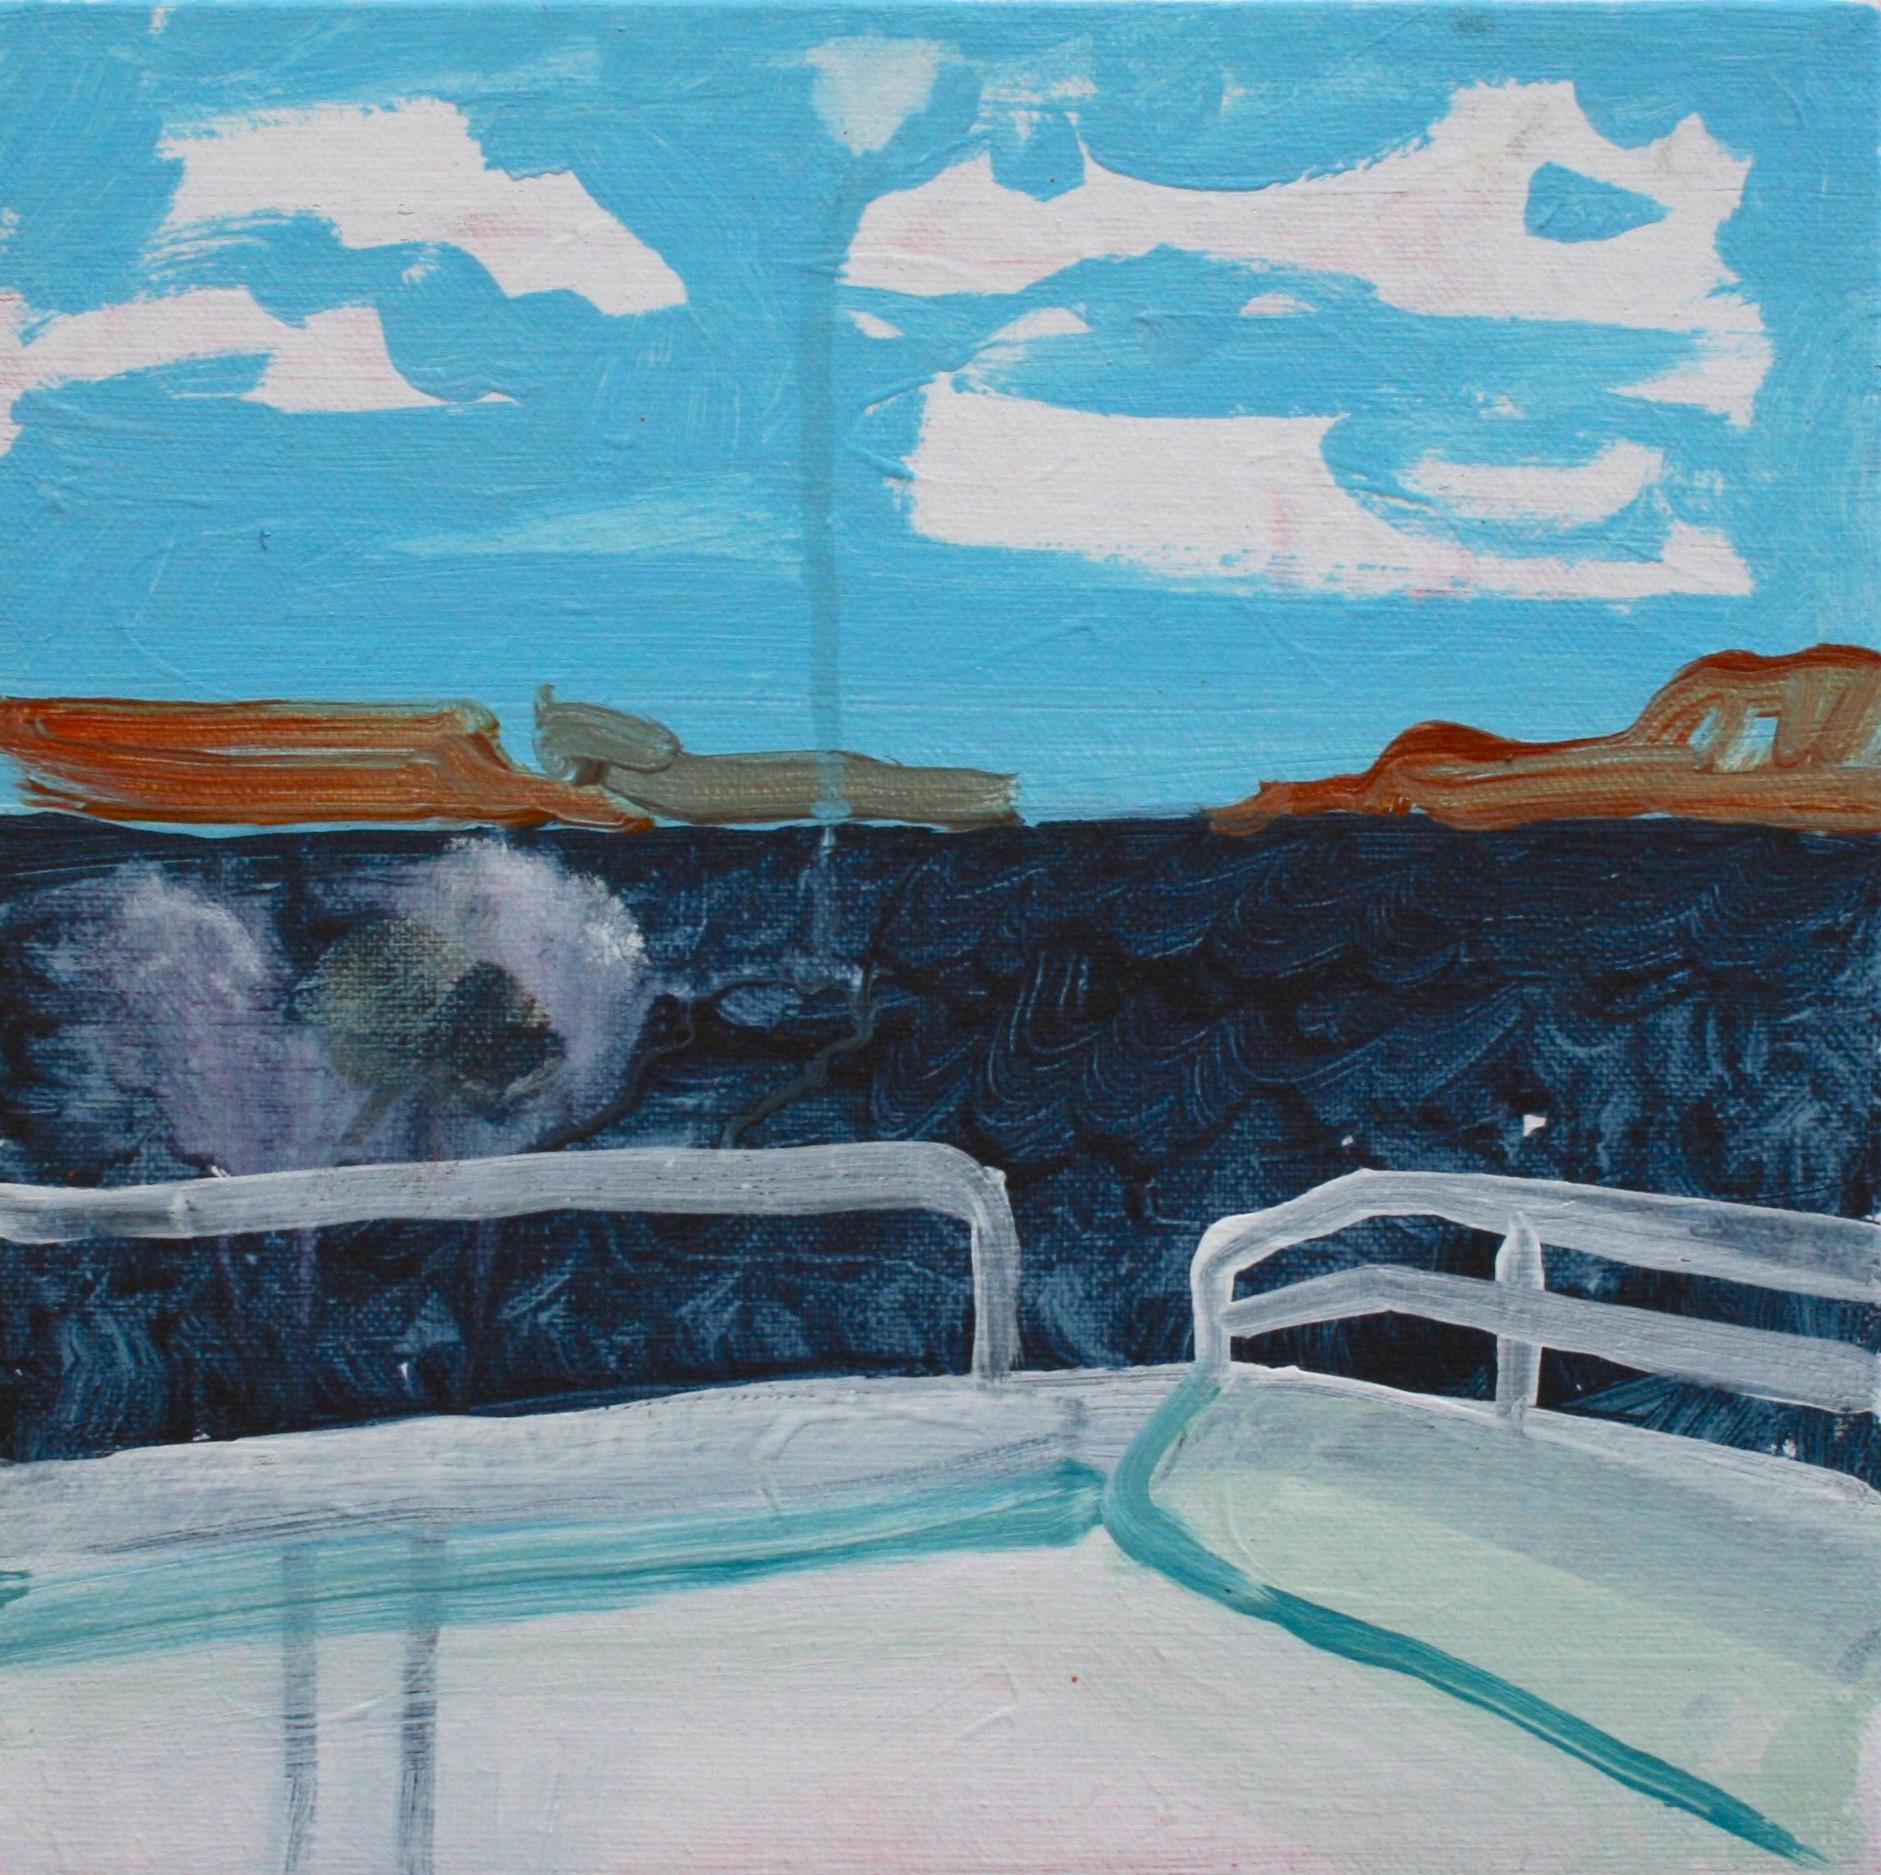 "Lake Powell Sketch / Acrylic on canvas, 2016, 12"" x 12""© 2014"